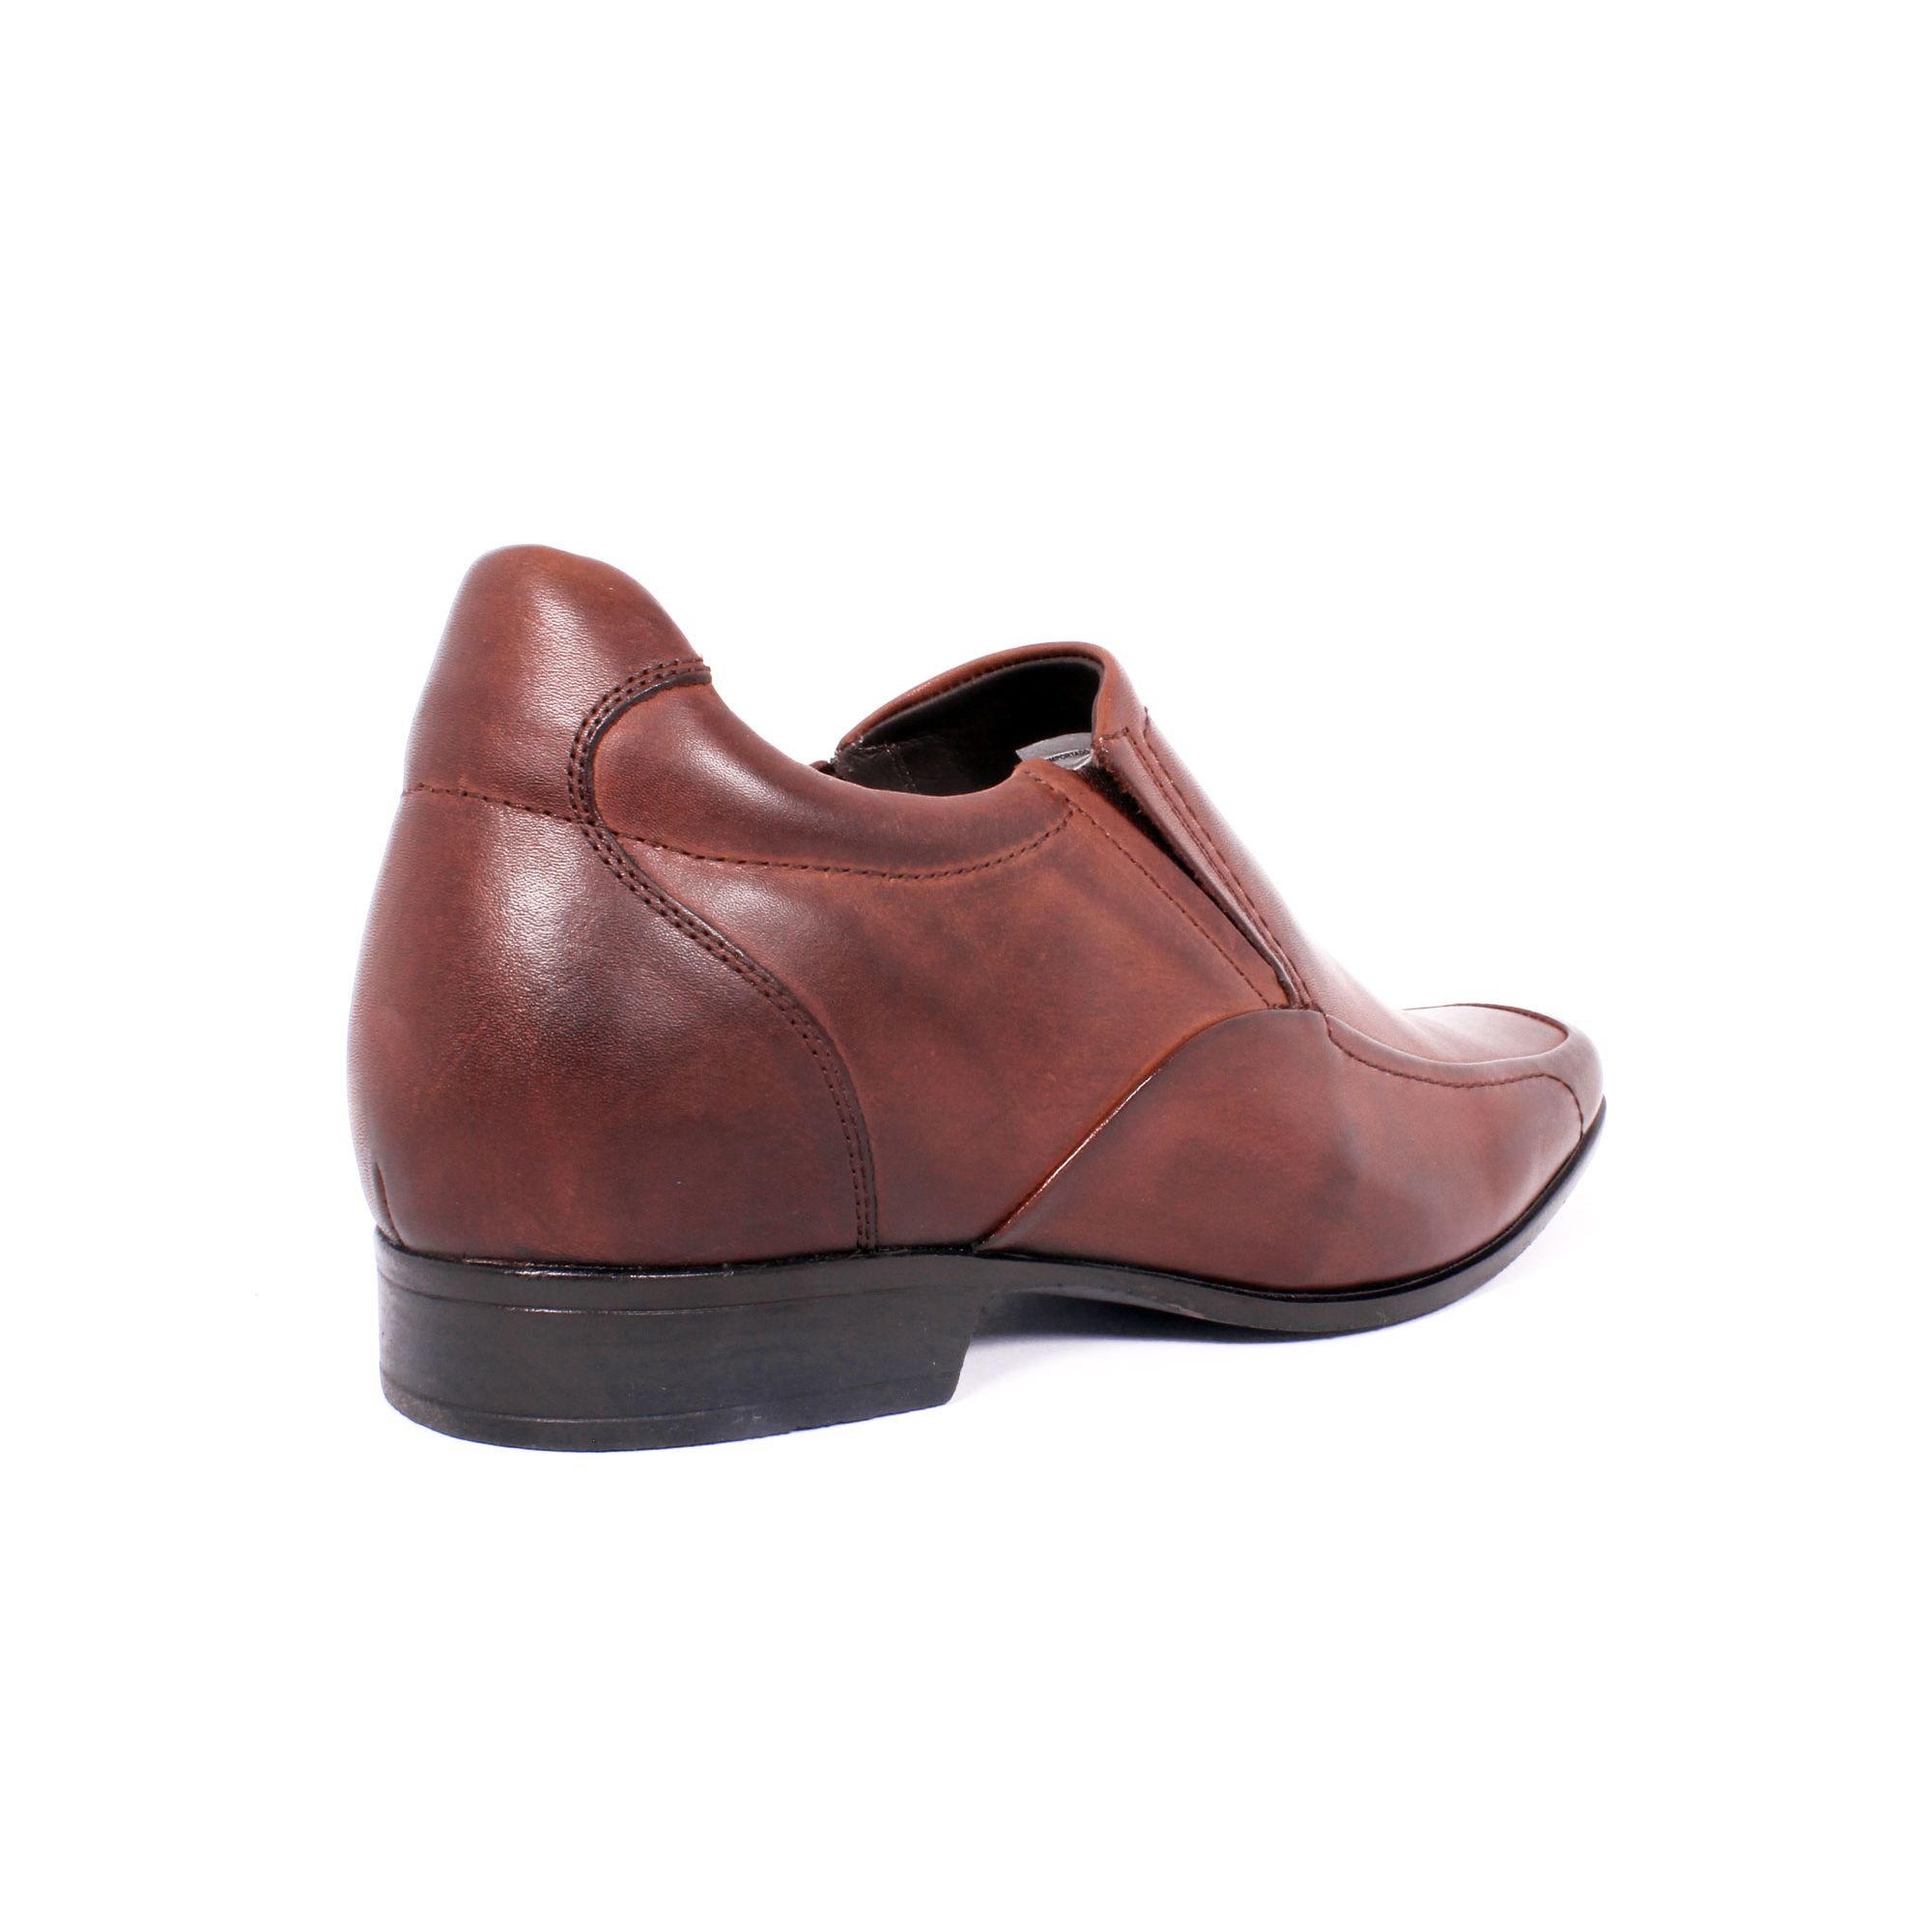 Zapato Formal Tabaco Café Max Denegri +7cm de Altura_70847